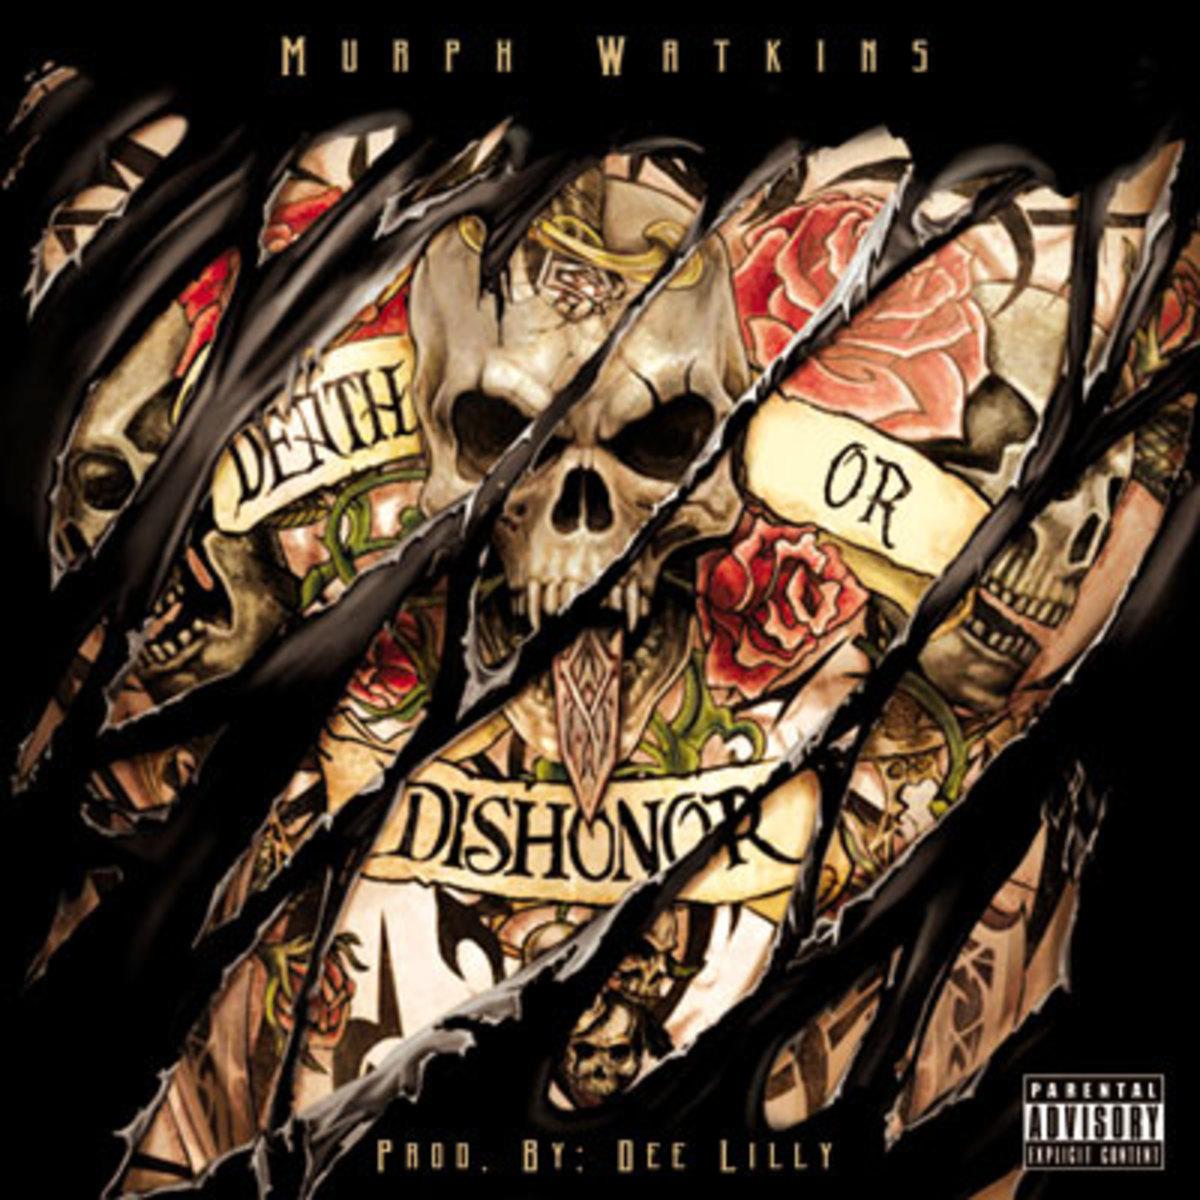 murphwatkins-deathor.jpg